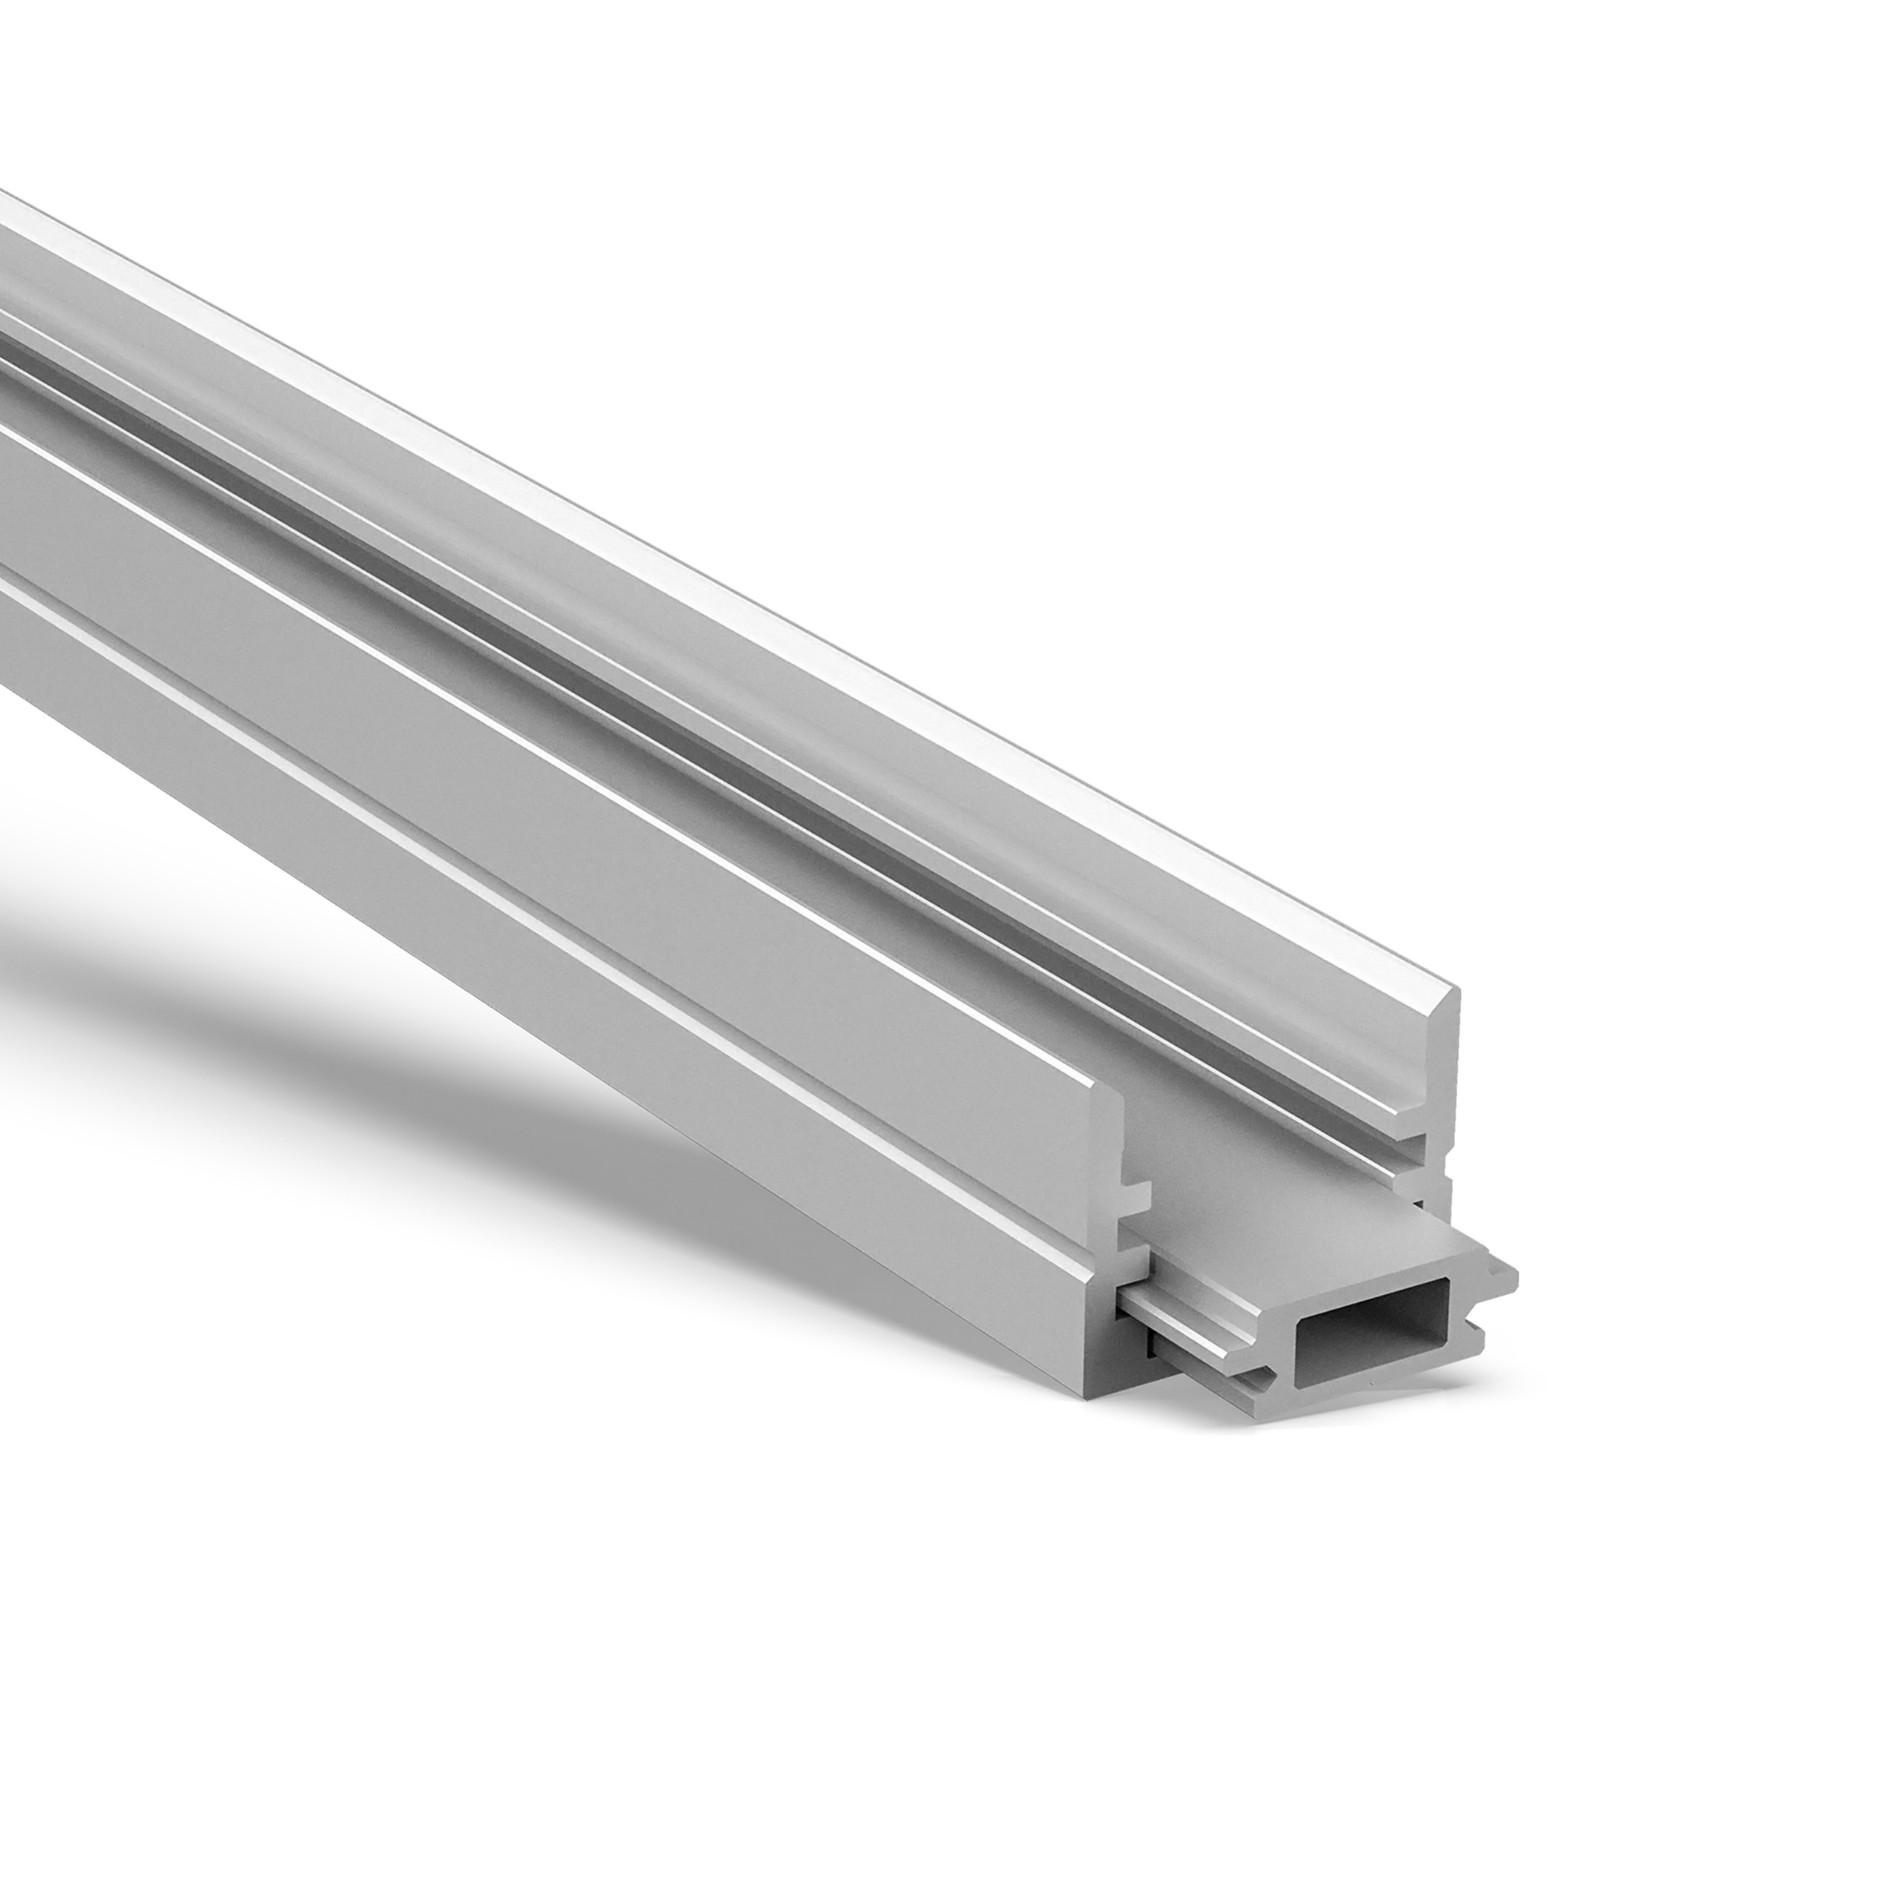 MD Adjustable light angle aluminum profile housing 17x17.8mm